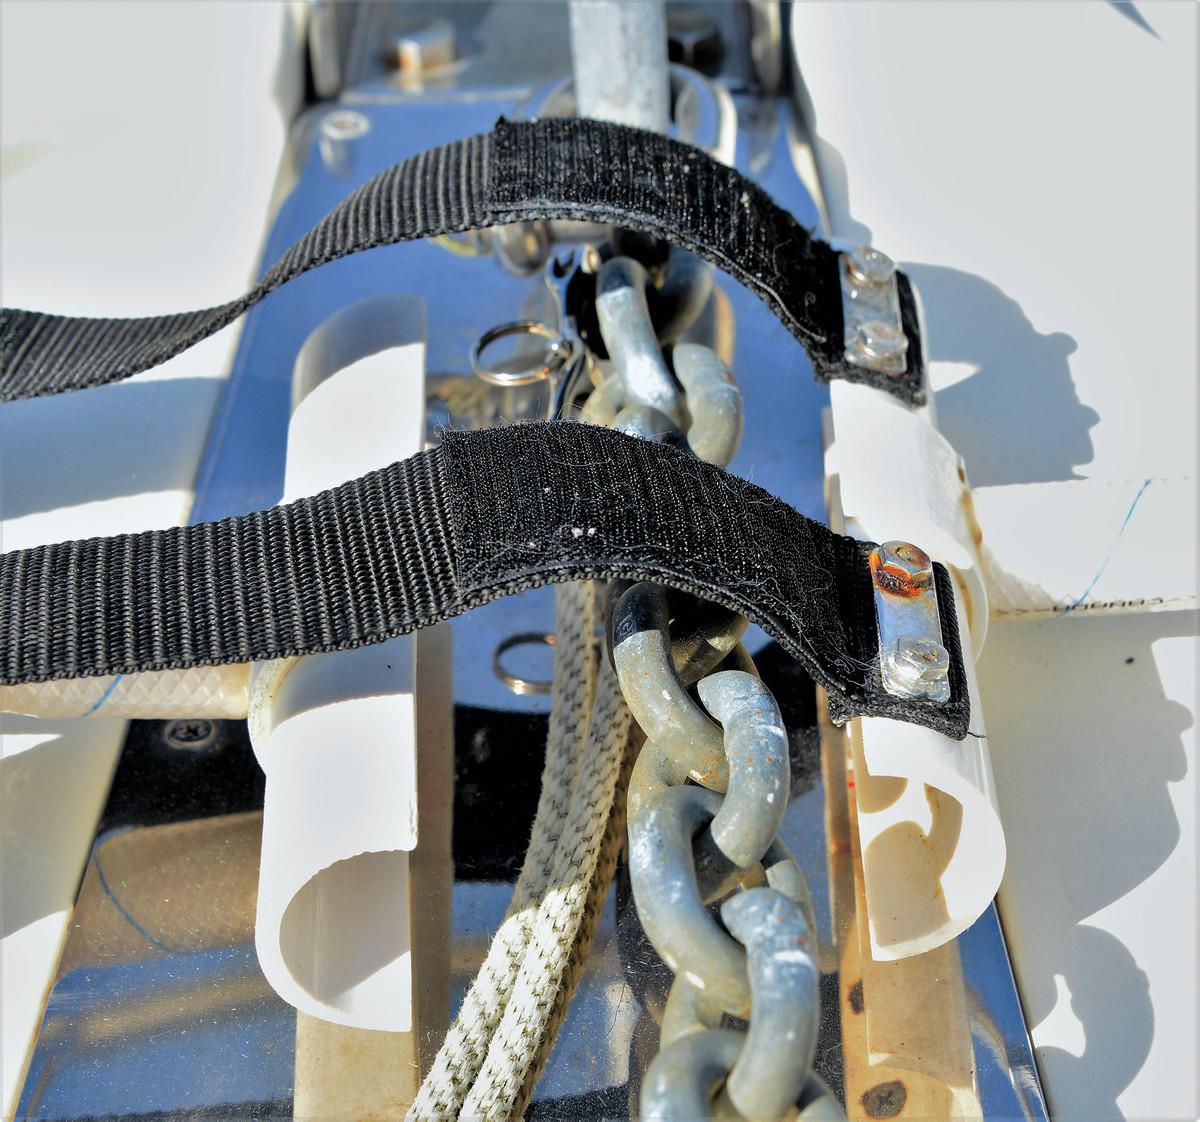 Ed Dettling's anchor chain washdown rig.